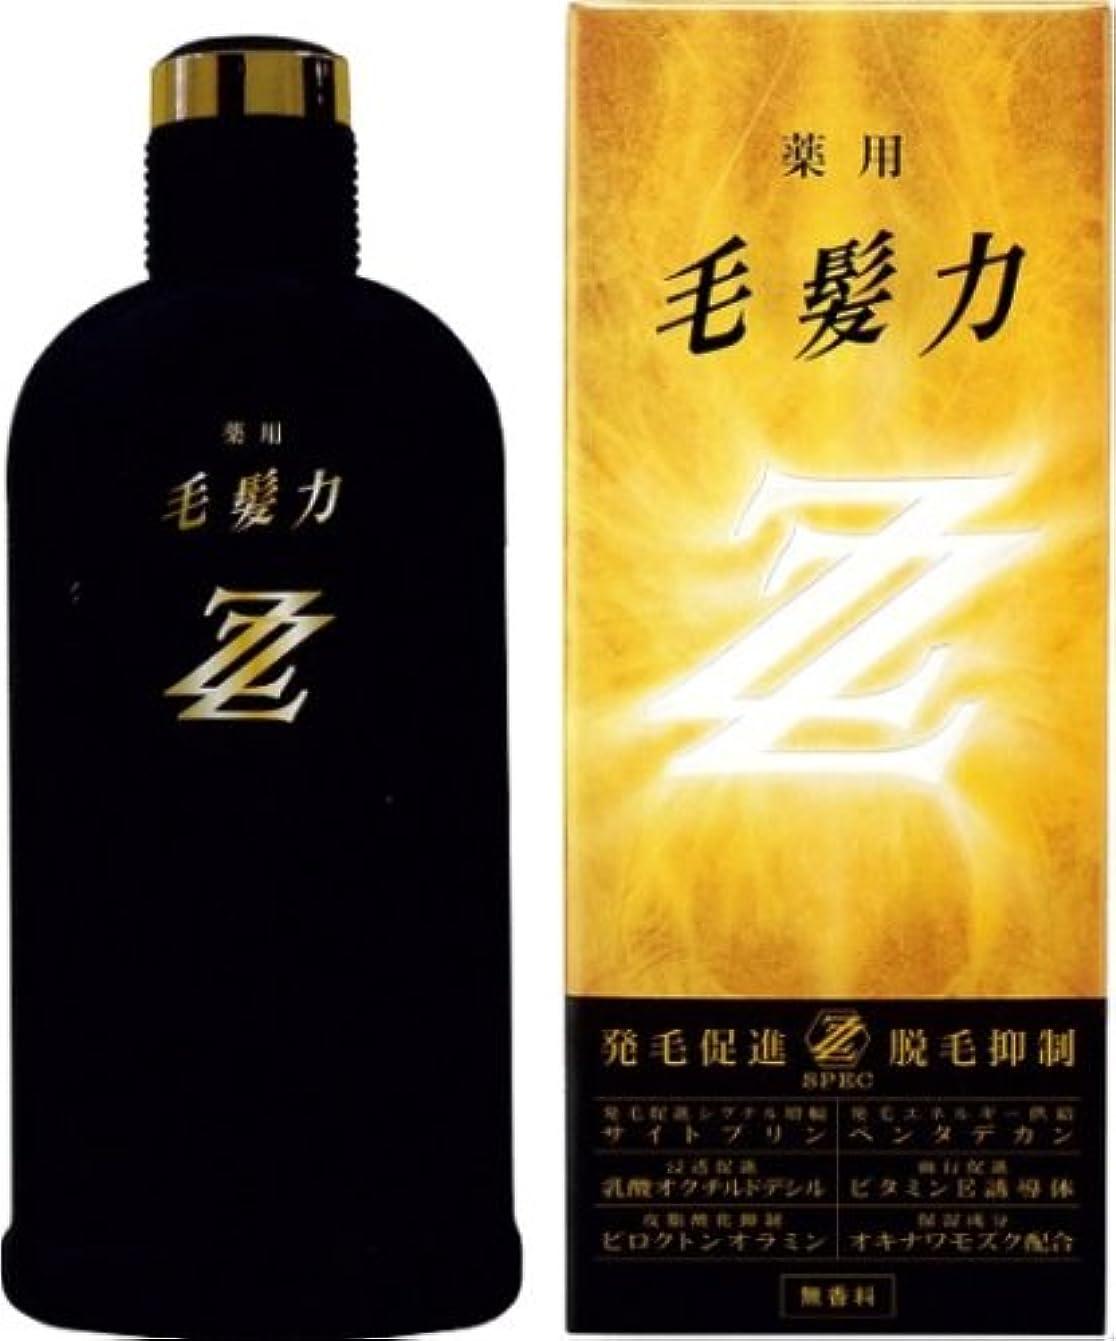 ルーフ奨学金蜜薬用毛髪力ZZ(ダブルジー) 育毛剤 200ml(医薬部外品)